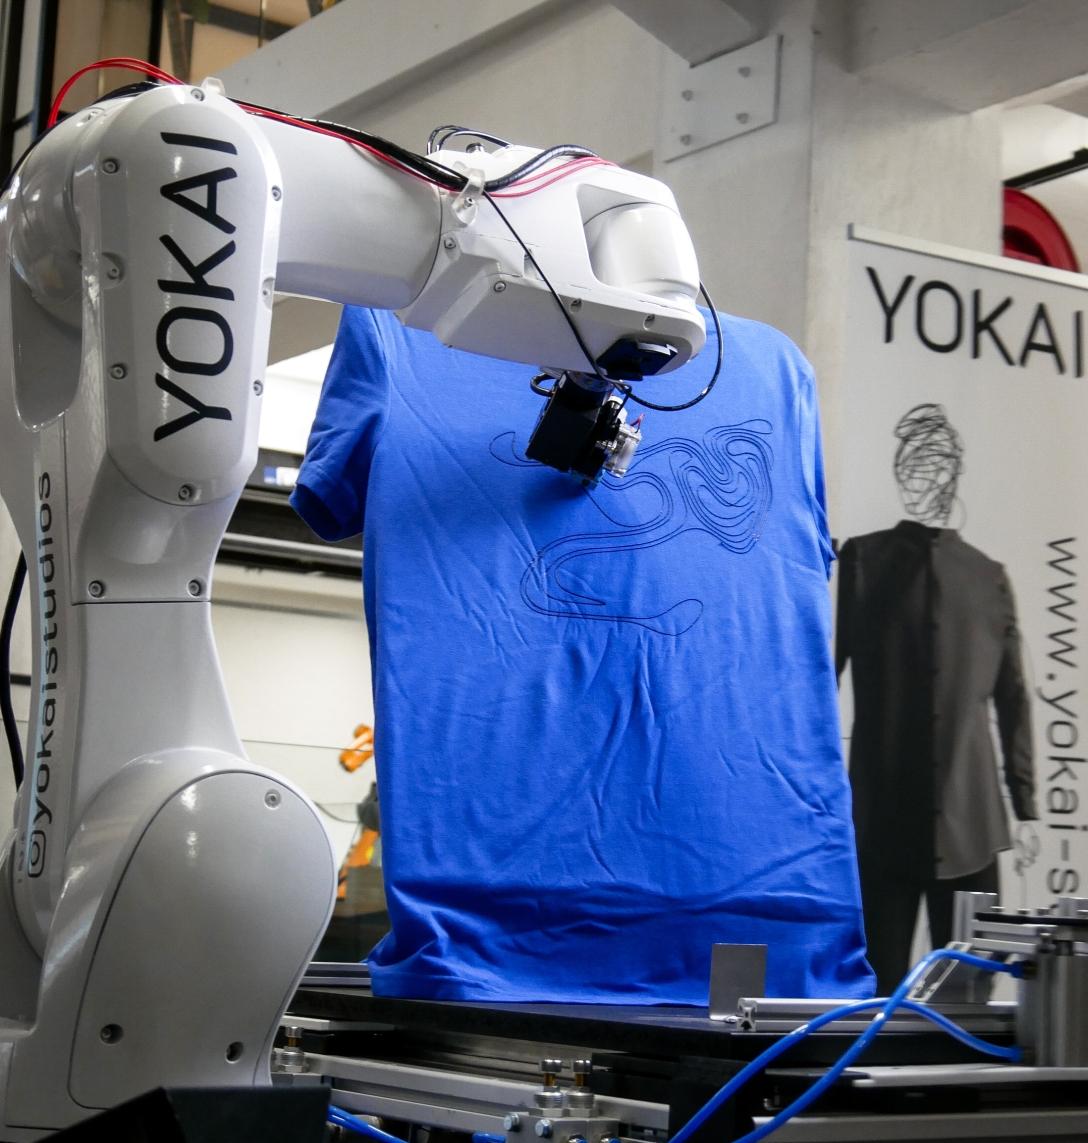 Printroboter, generativer Designcolde, Yoga Studios,